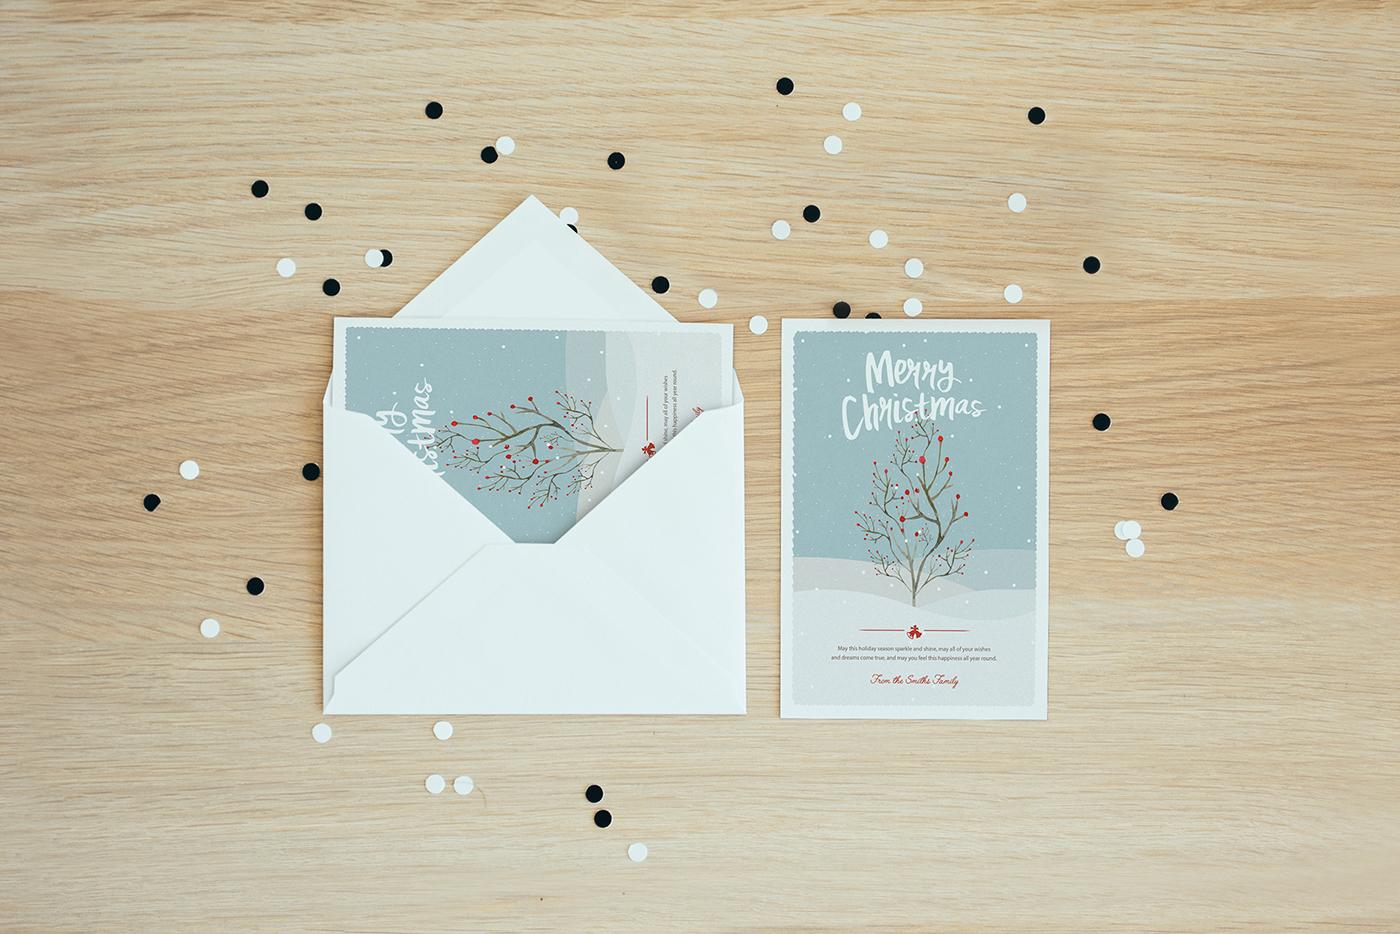 Christmas Greetings cards Merry Christmas photo cards postcards Happy Holidays flyers navidad postales navideñas new year eve